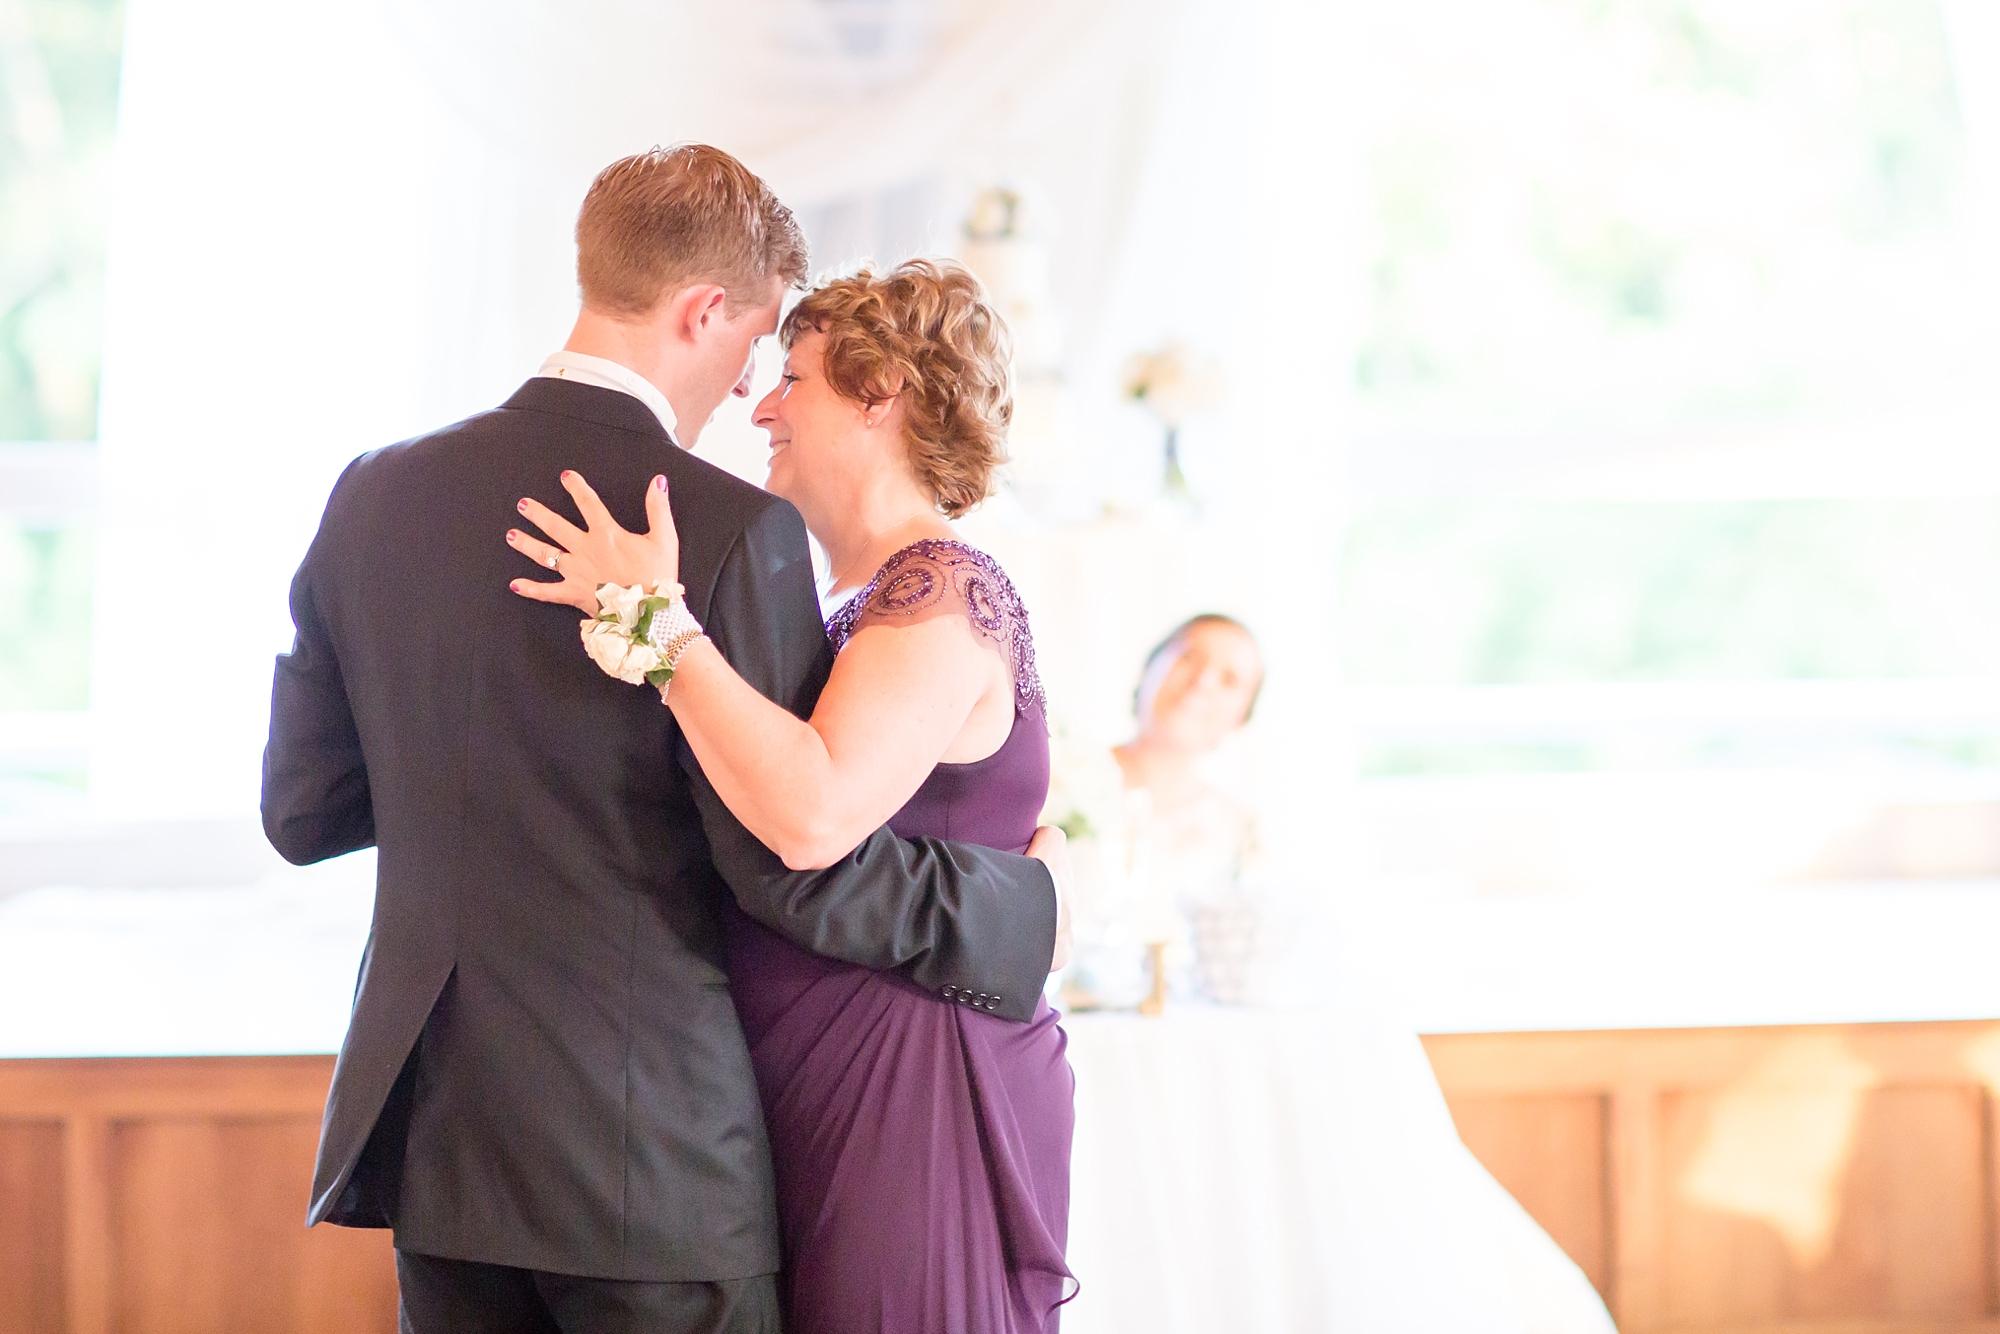 Somerville 6-Reception-425_anna grace photography sherwood forest annapolis maryland wedding photographer photo.jpg